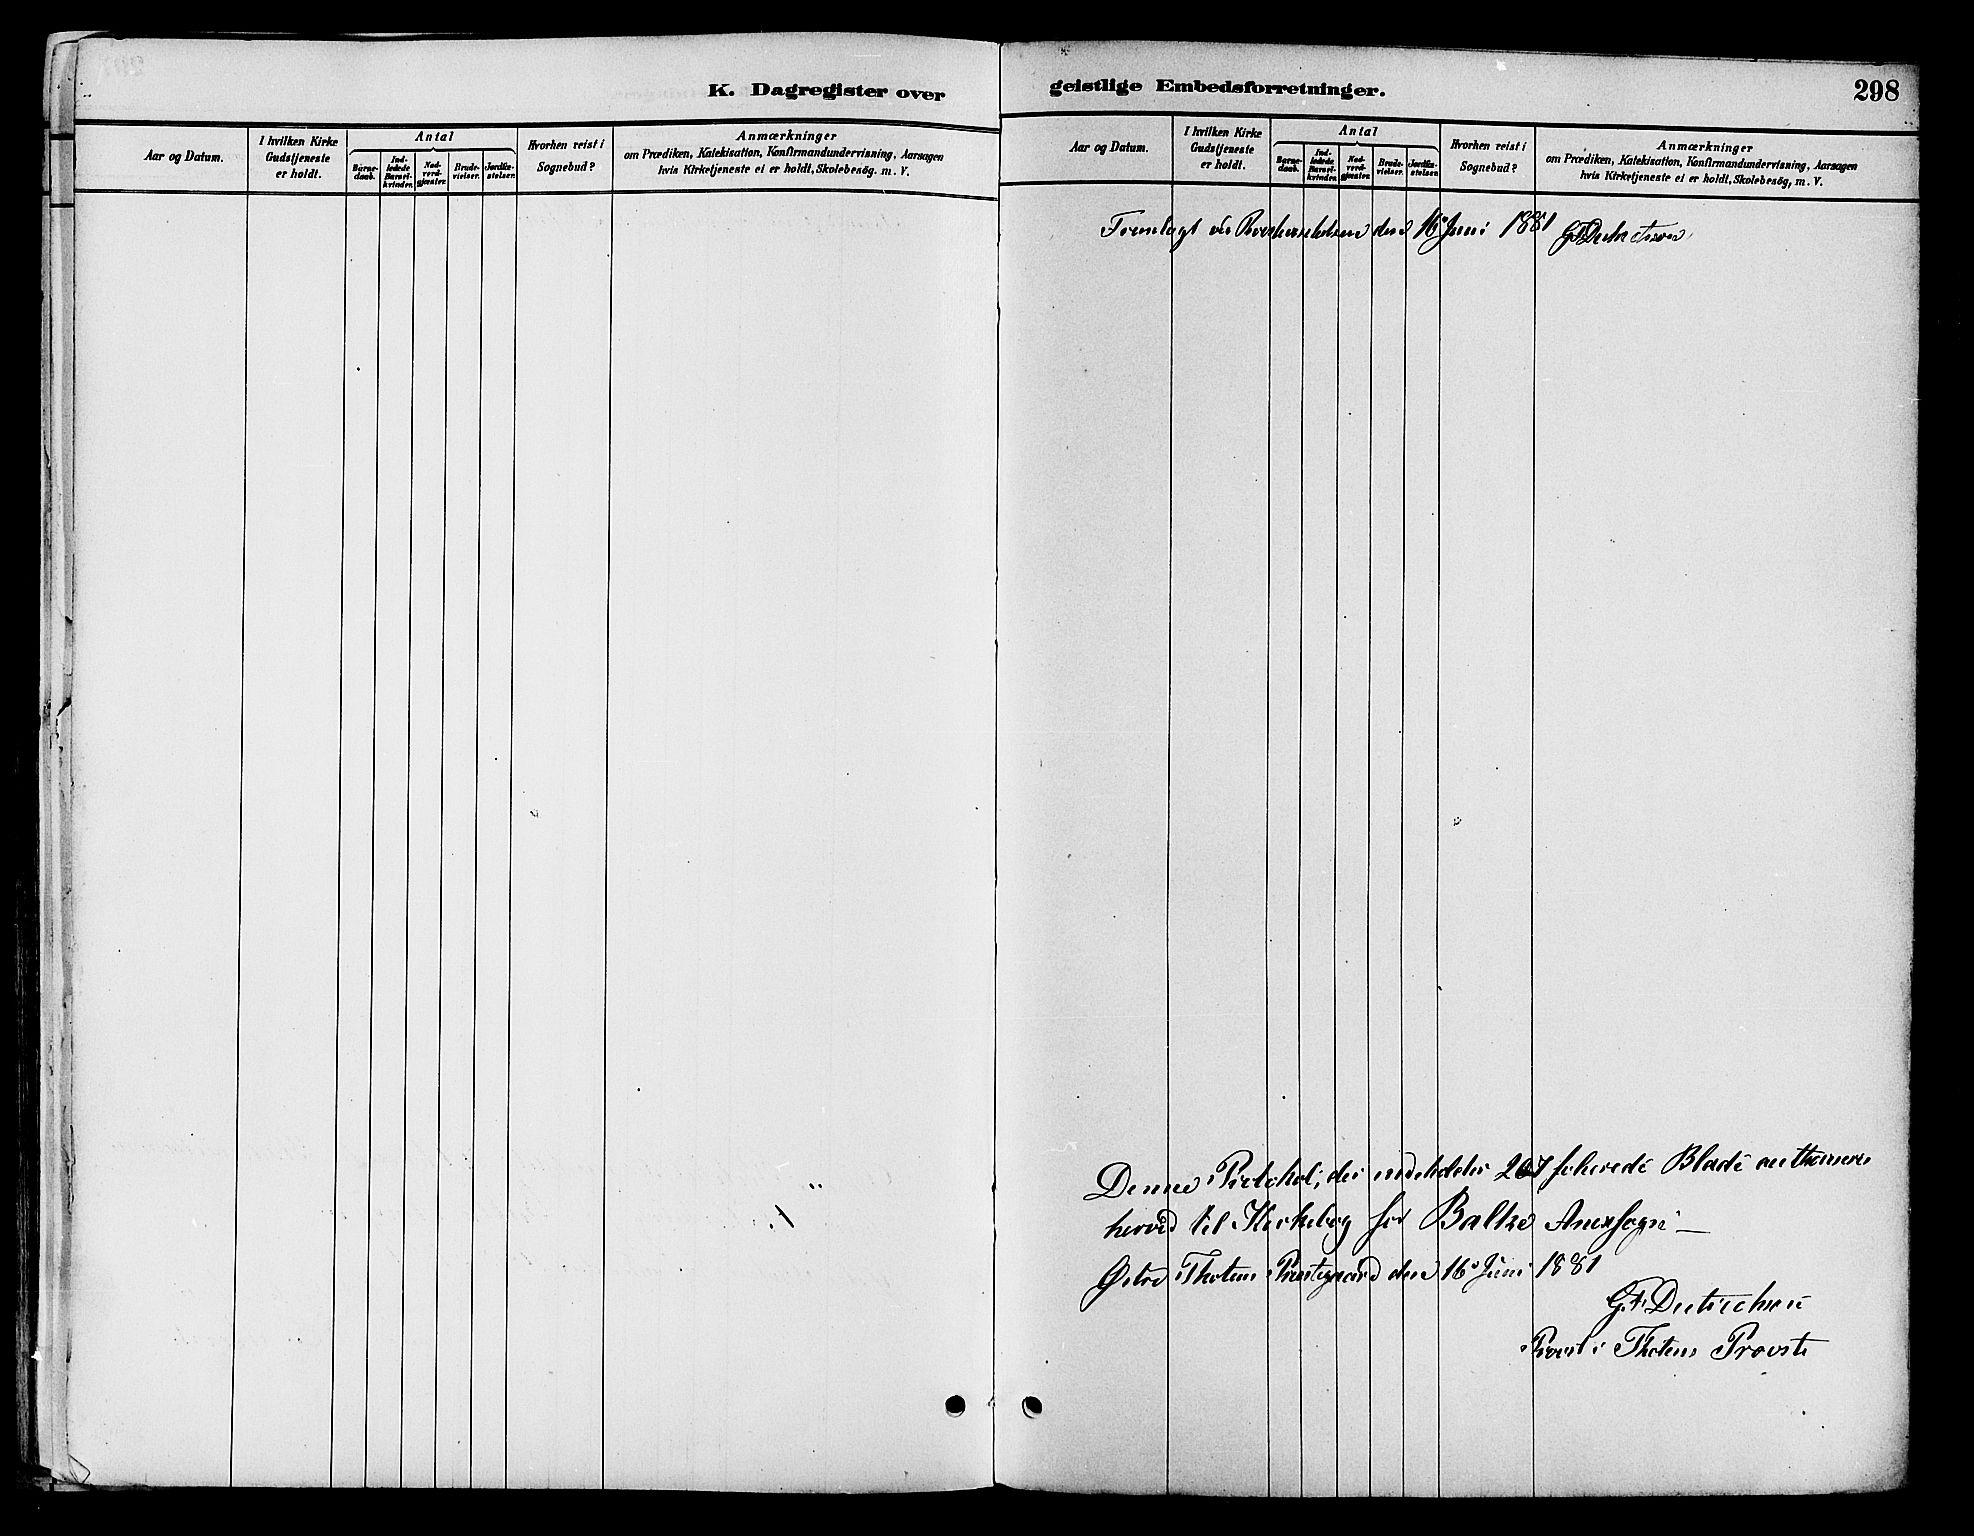 SAH, Østre Toten prestekontor, Ministerialbok nr. 7, 1881-1896, s. 298